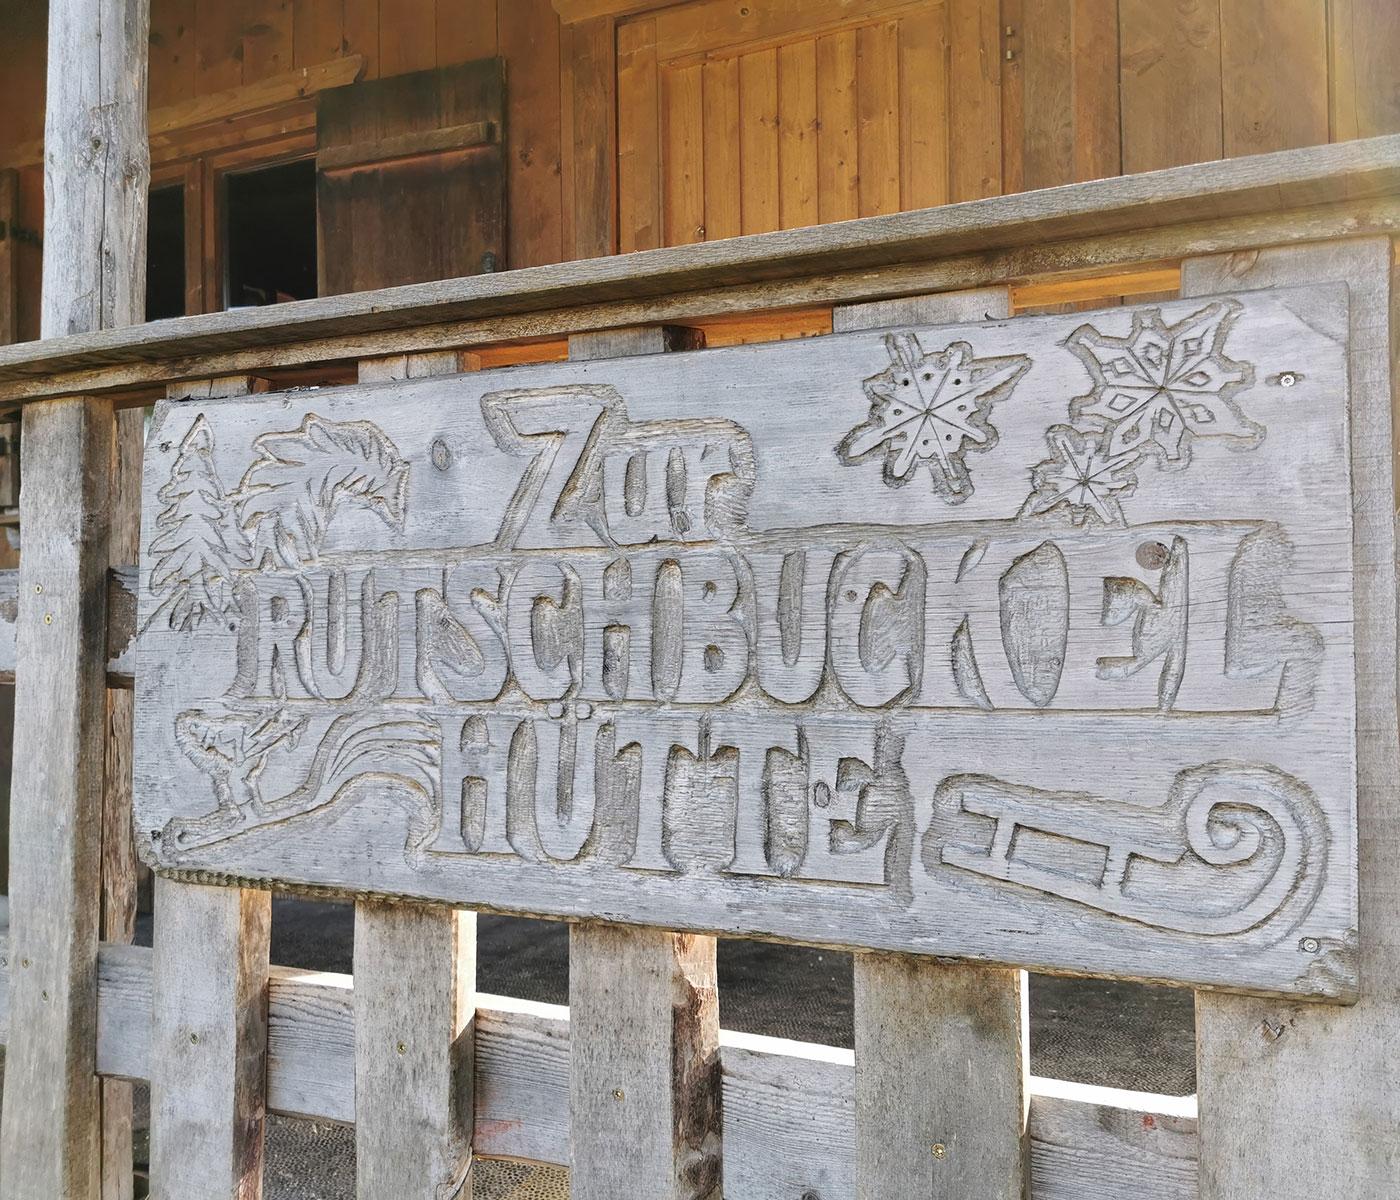 Sieben-Quellen-Sagenspaziergang: Rutschbuckelhütte // HIMBEER